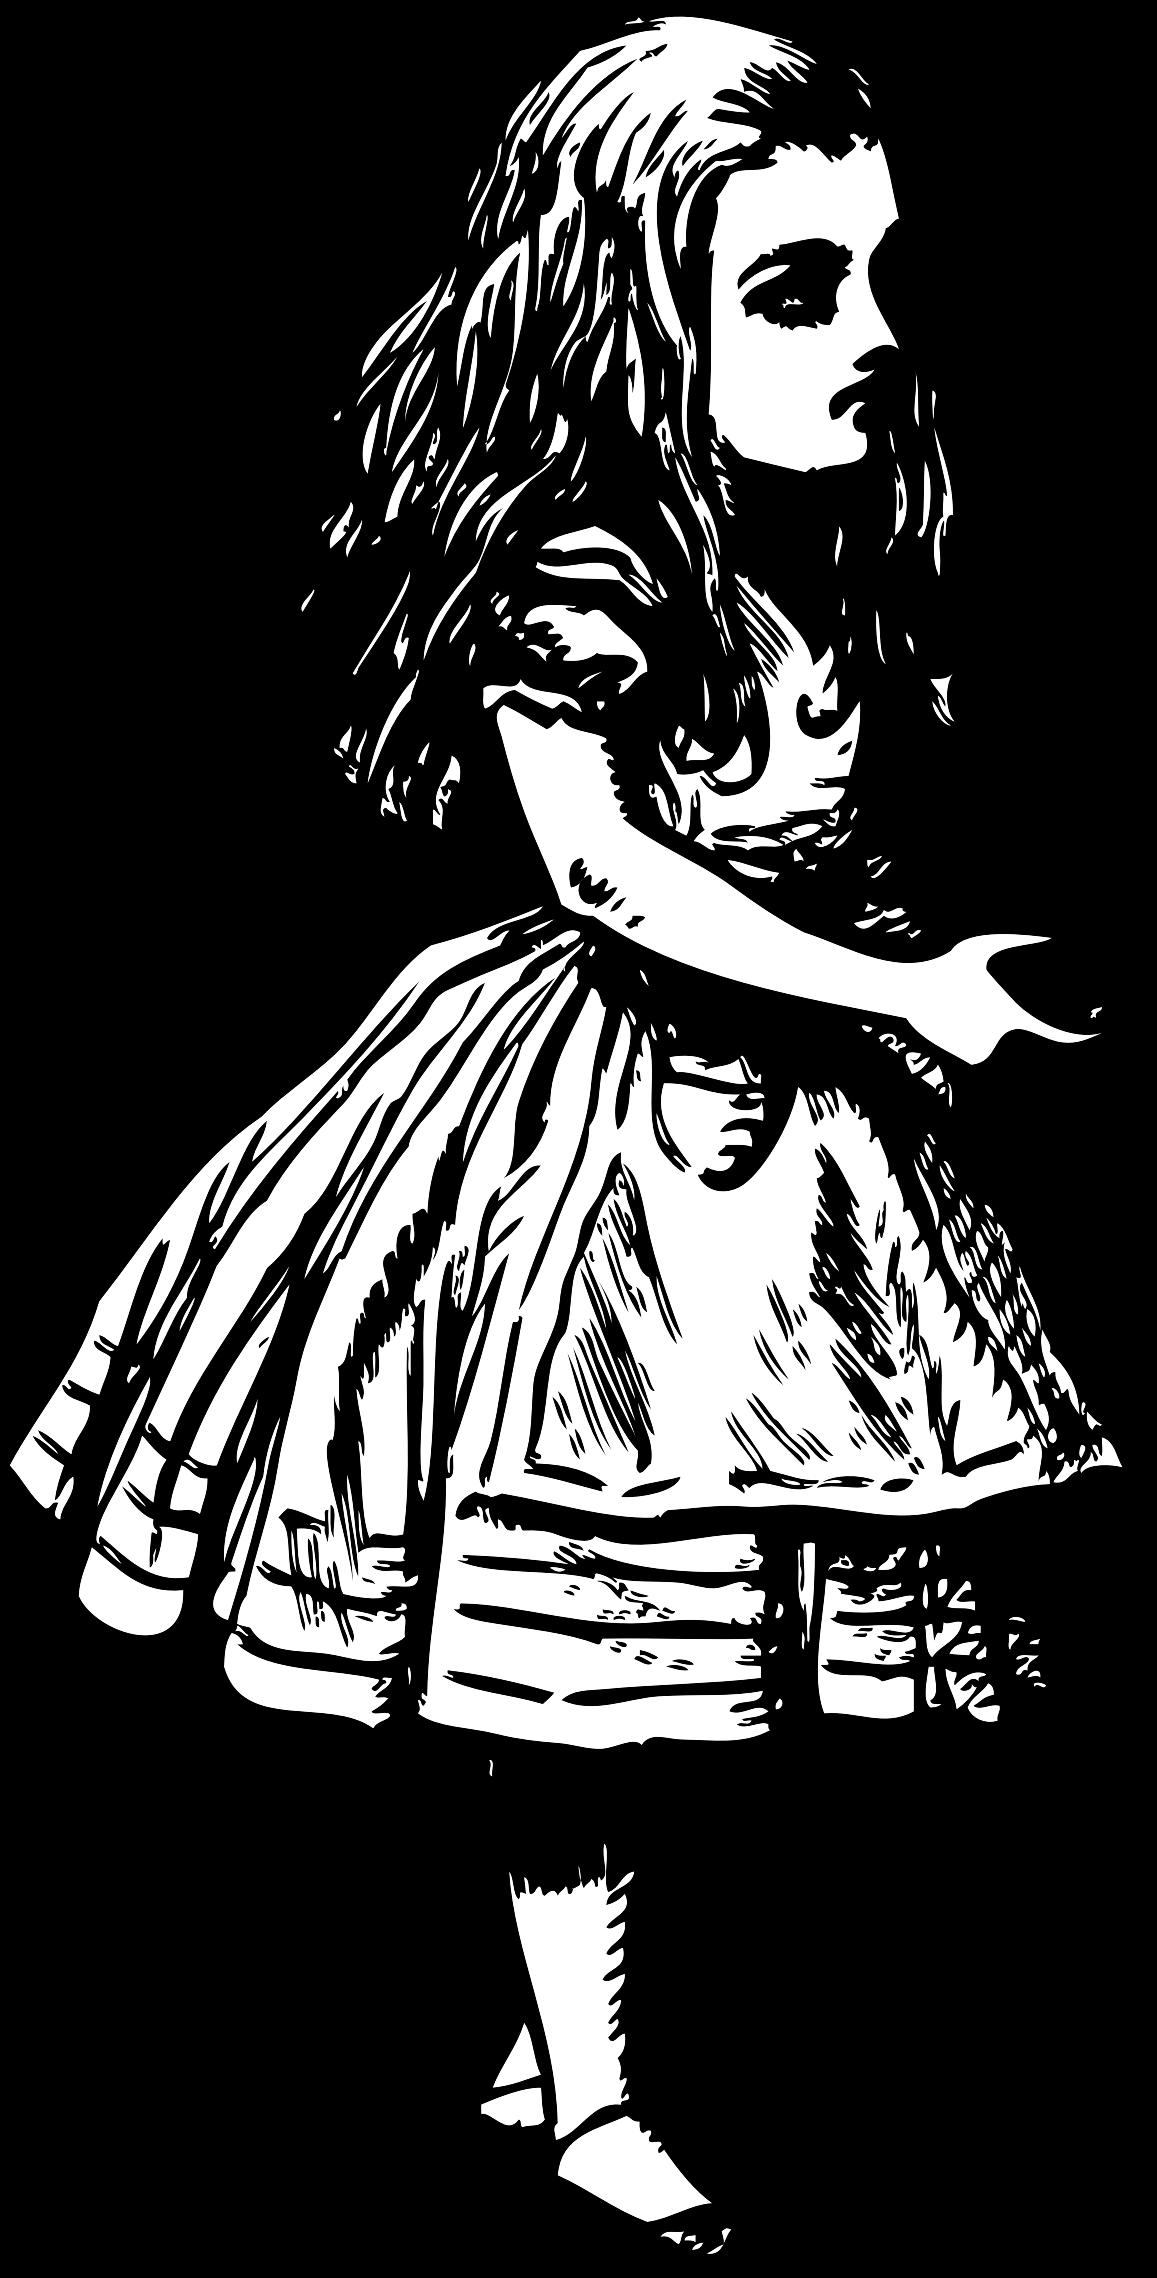 Alice in wonderland book clipart jpg royalty free download Clipart - Alice (in wonderland) jpg royalty free download